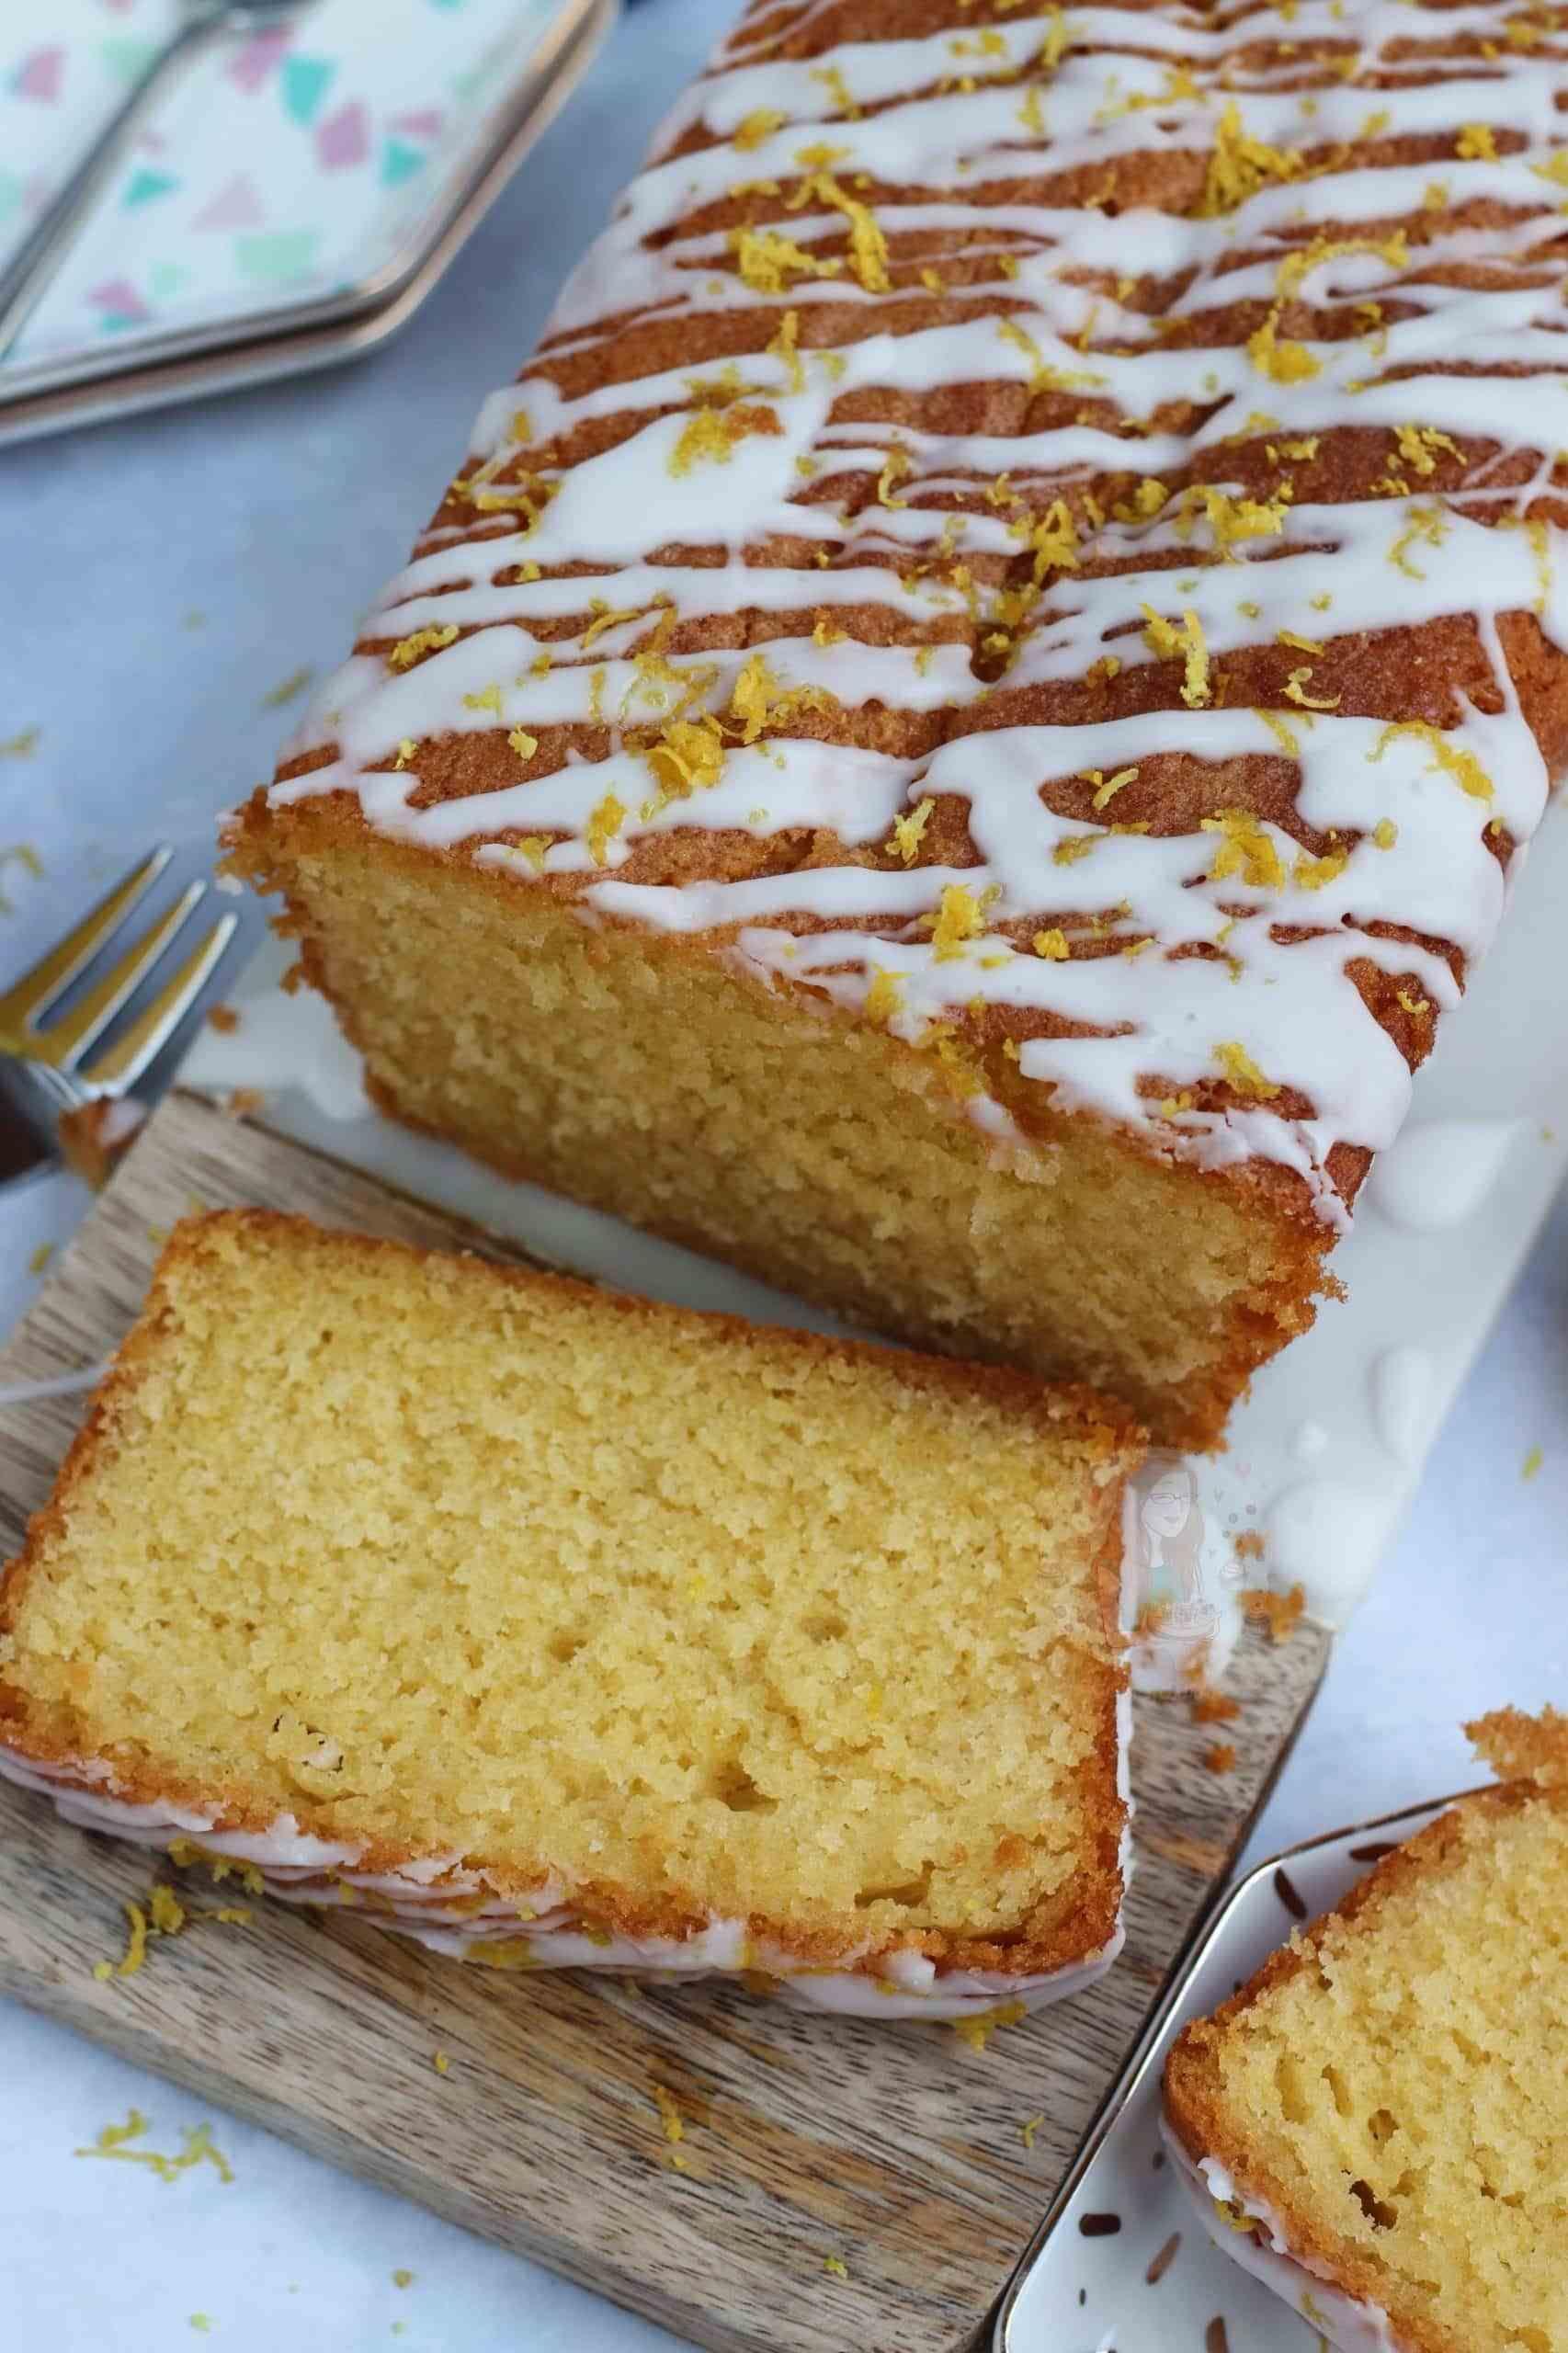 Lemon Drizzle Loaf Cake In 2020 Janes Patisserie Baking Recipes Loaf Cake